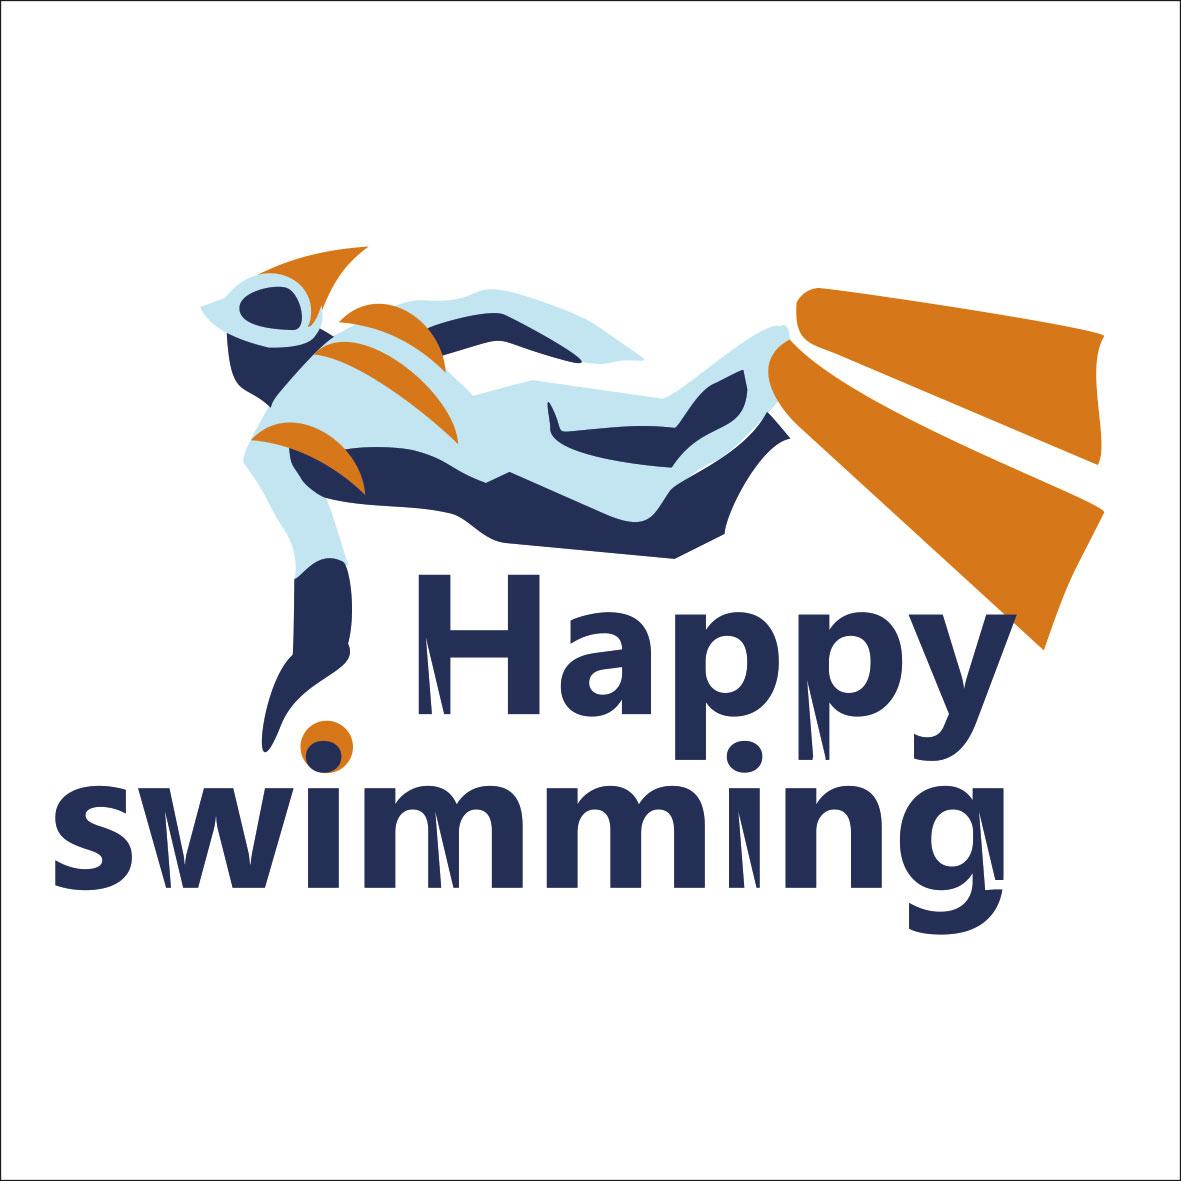 Логотип для  детского бассейна. фото f_5335c73f7fbba6ef.jpg